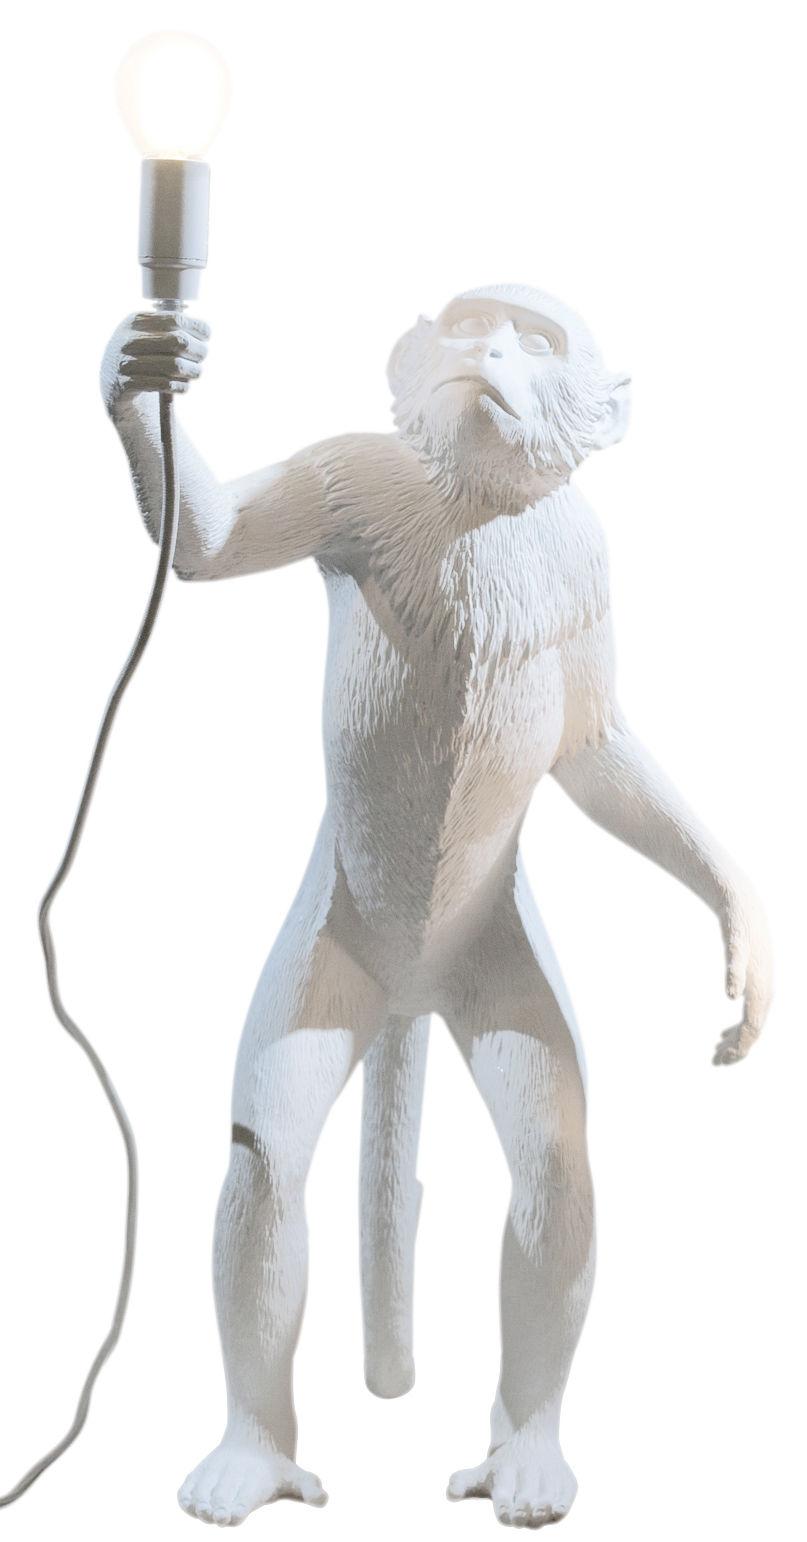 ... de table > Lampe de table Monkey Standing / Indoor - H 54 cm - Seletti Union J Monkey